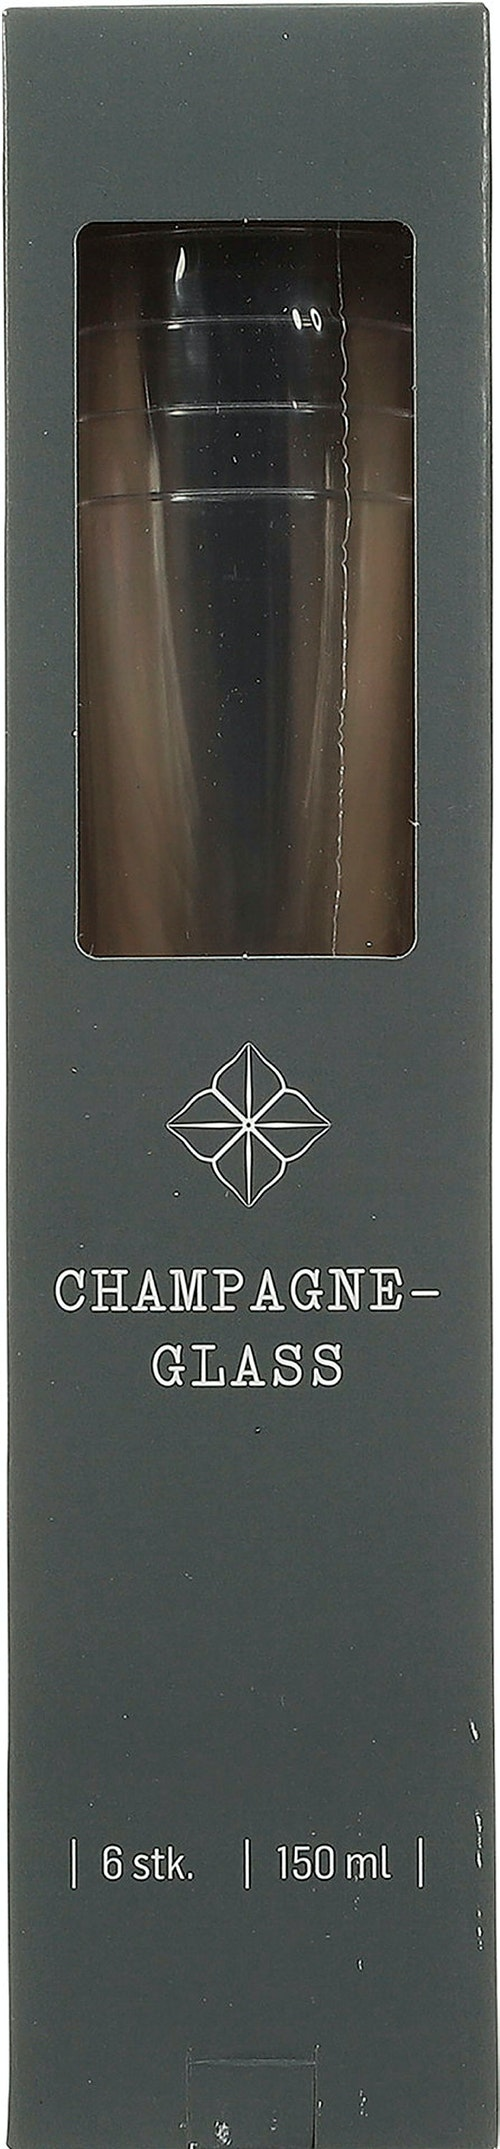 REMA 1000 Champagneglass i Plast 6 stk